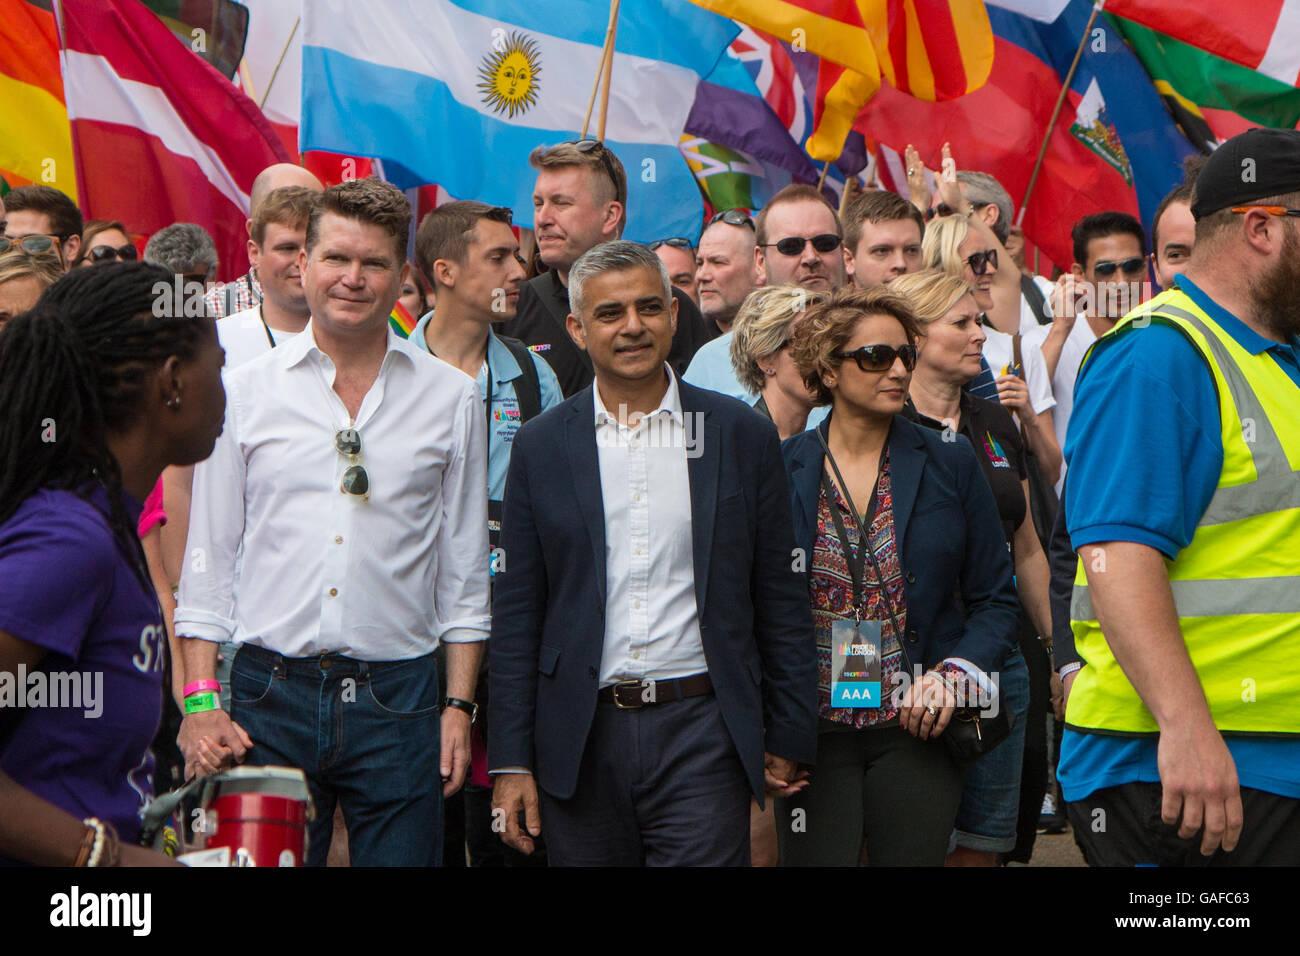 US Ambassador, Sadiq Khan (mayor of London) and his wife at Pride in London 2016 - Stock Image